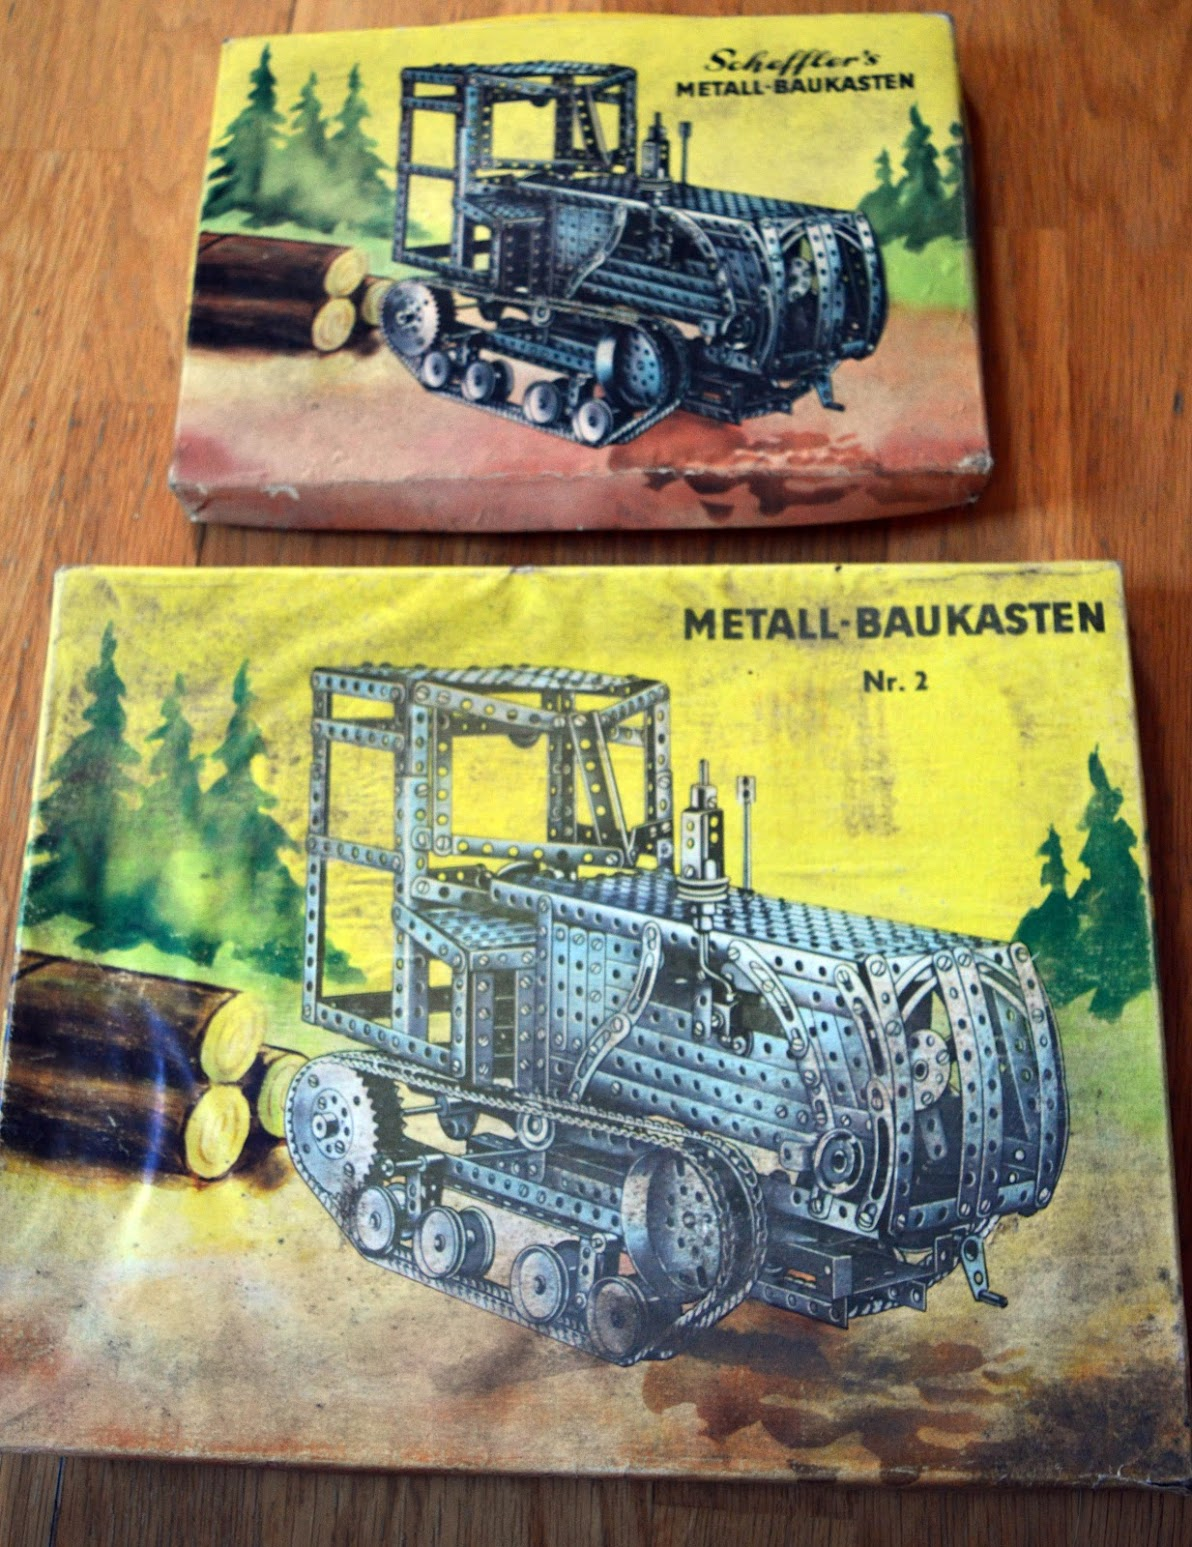 Metall-Baukasten